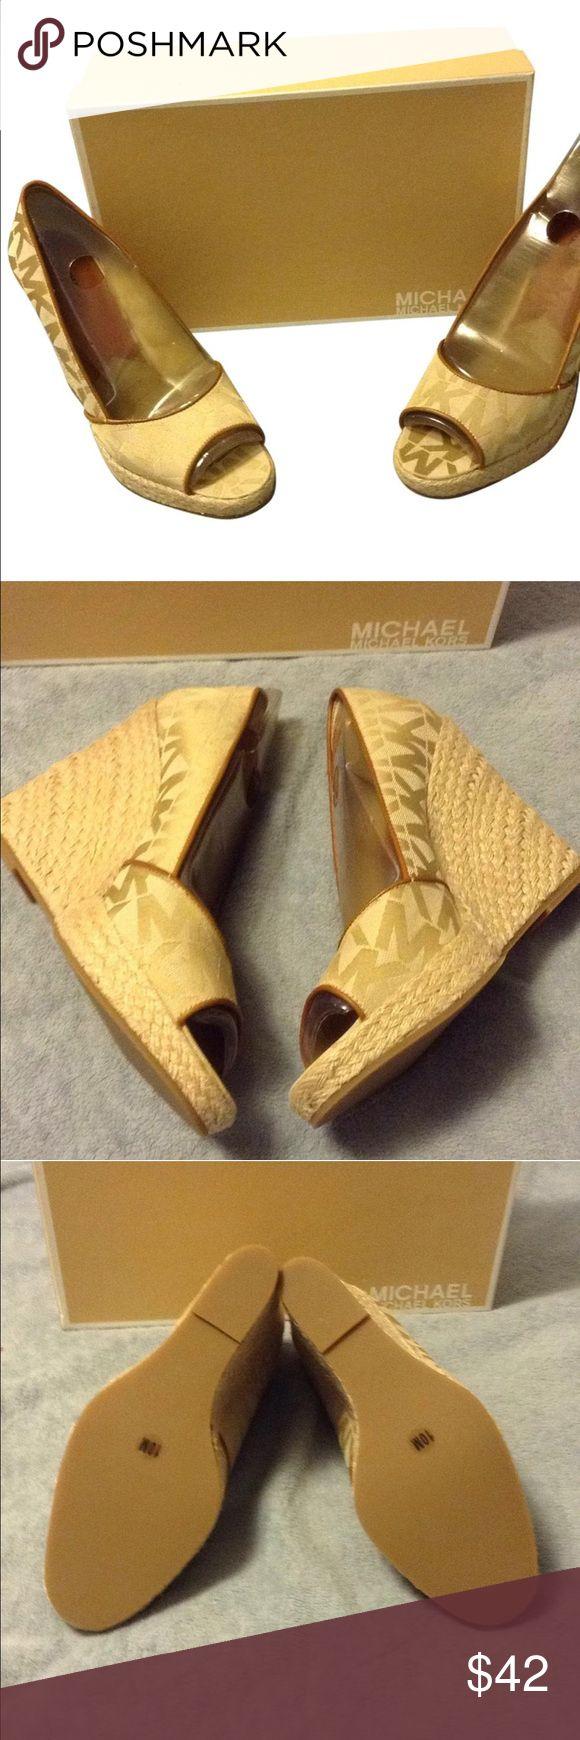 Cabana open toe camel/beige wedges Brand new Michael Kors wedges in beige with MK print. Michael Kors Shoes Wedges